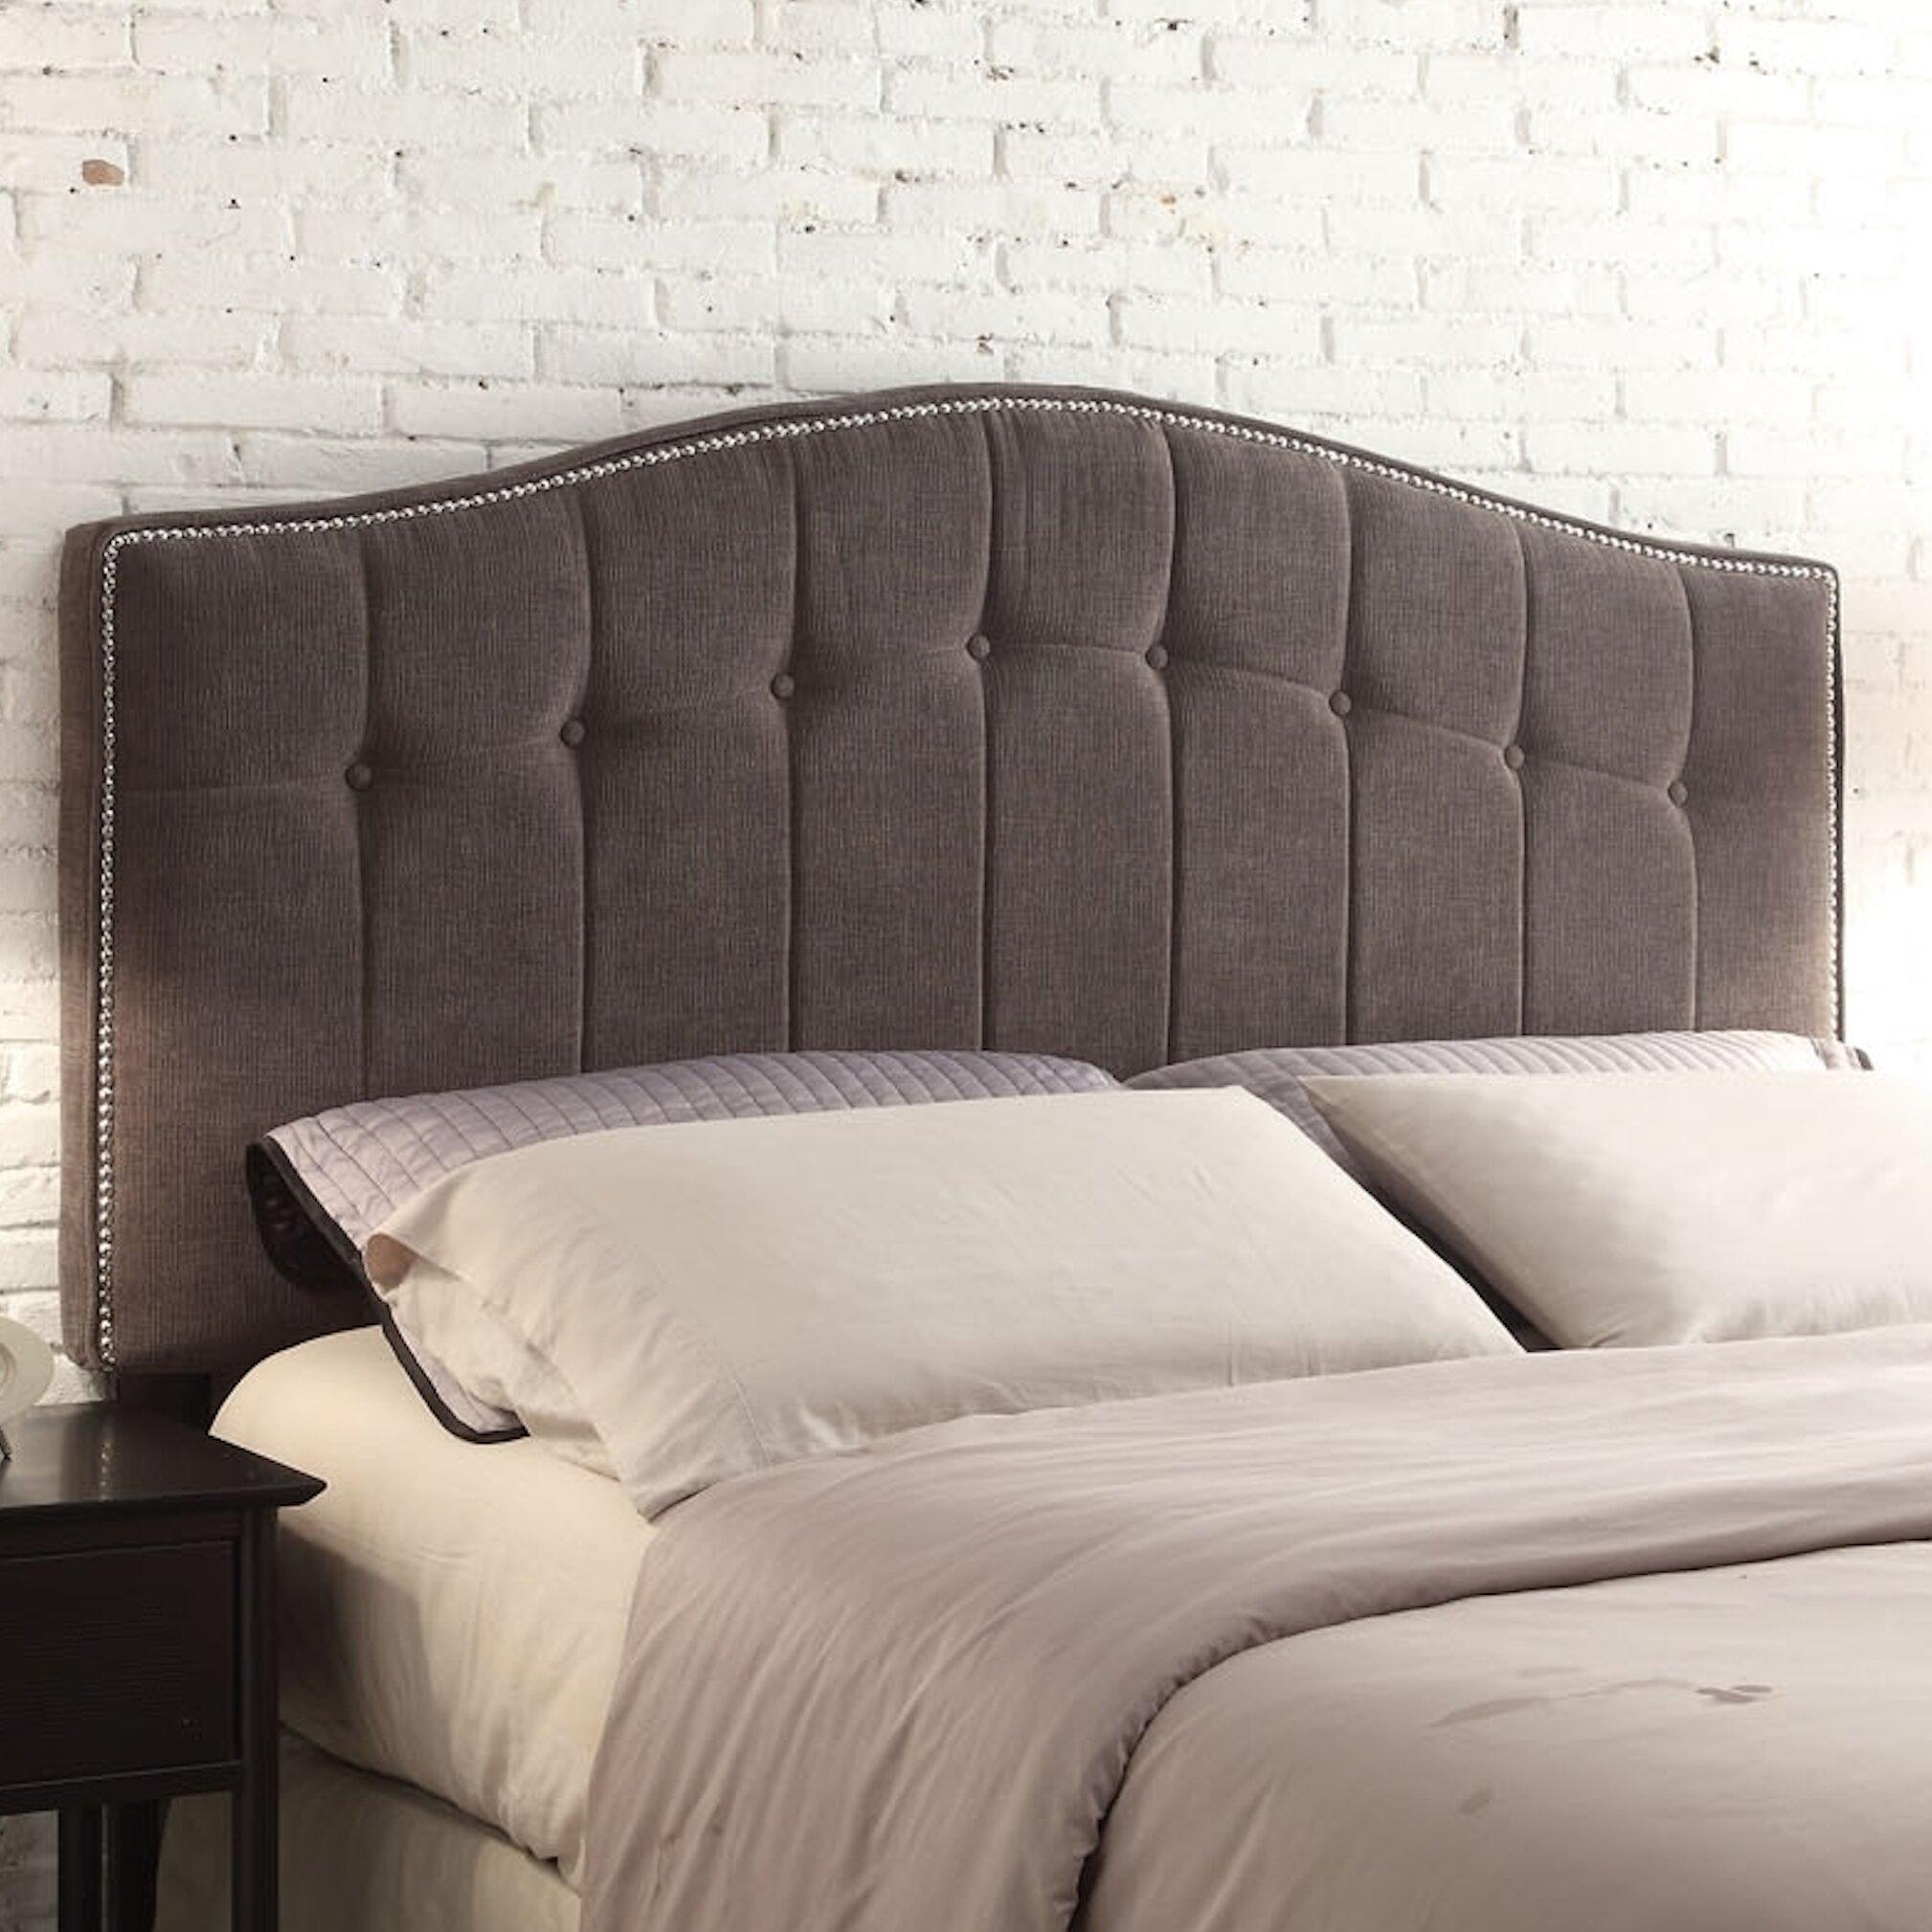 Napa Bedroom Furniture Chateau Imports Napa Upholstered Panel Headboard Reviews Wayfair